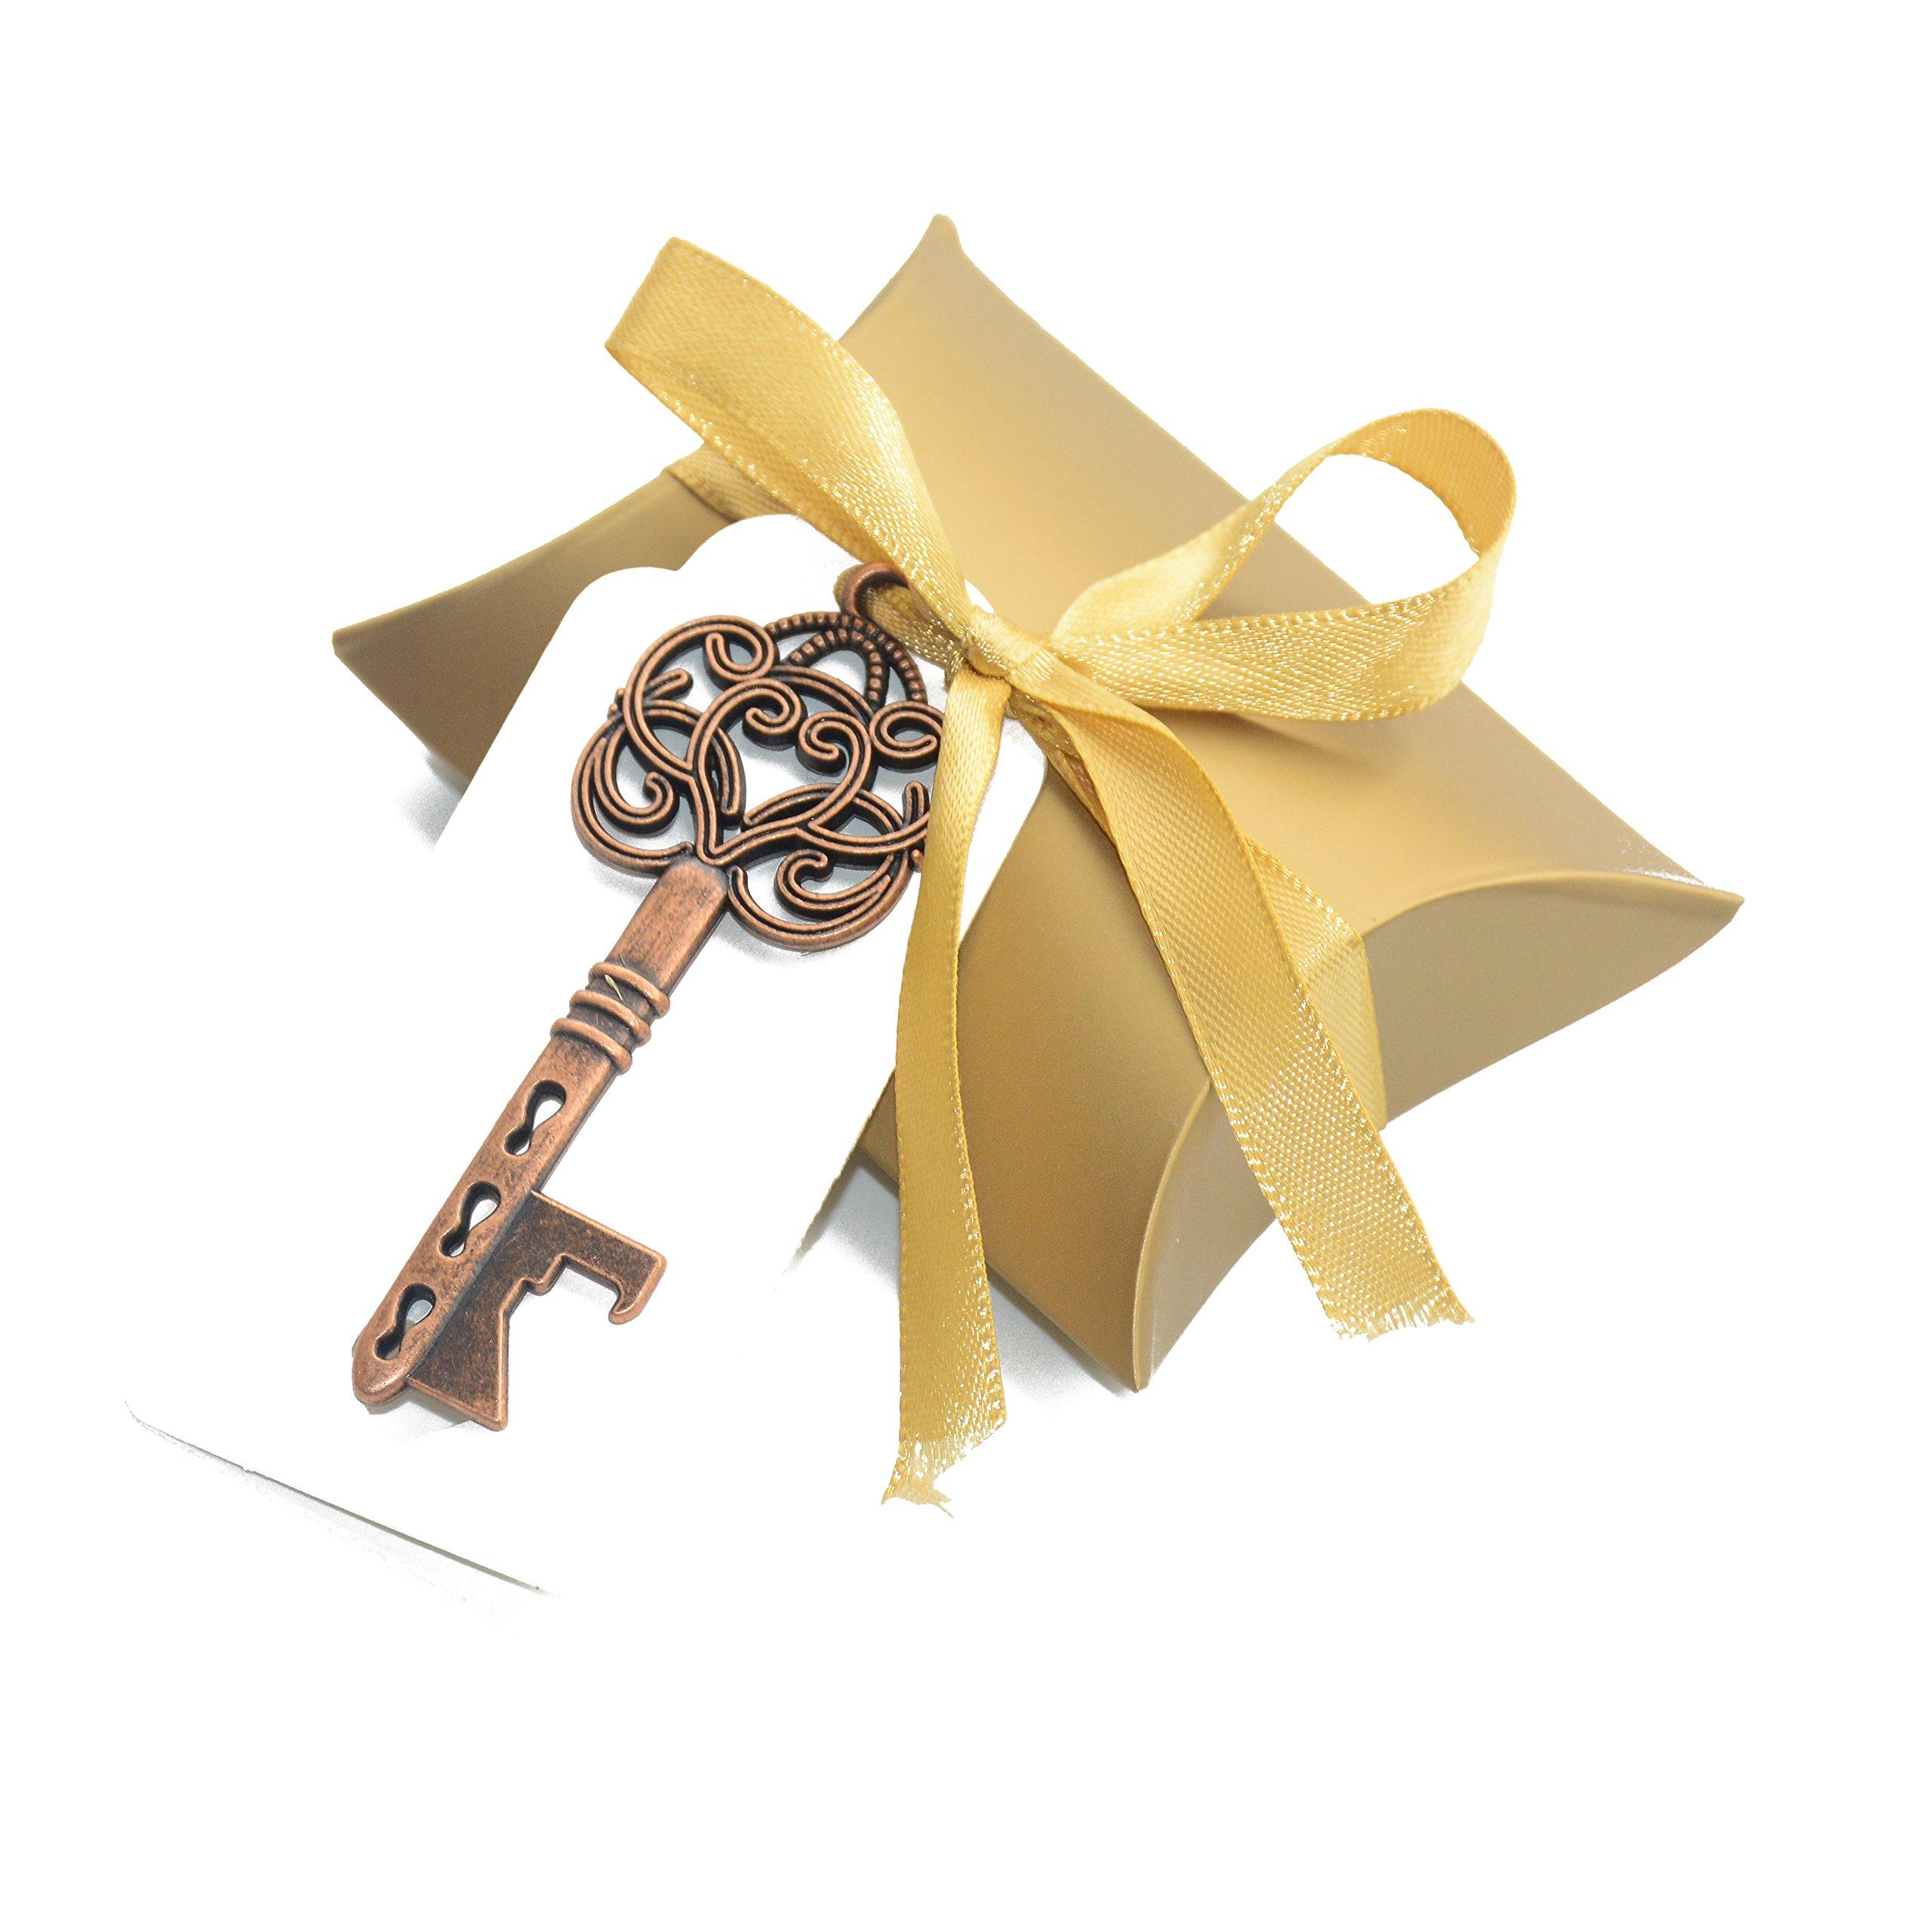 Aokbean 50pcs Vintage Skeleton Key Bottle Openers Wedding Favor Souvenir Gift Set Pillow Candy Box Escort Thank You Tag French Ribbon (Antique Copper)